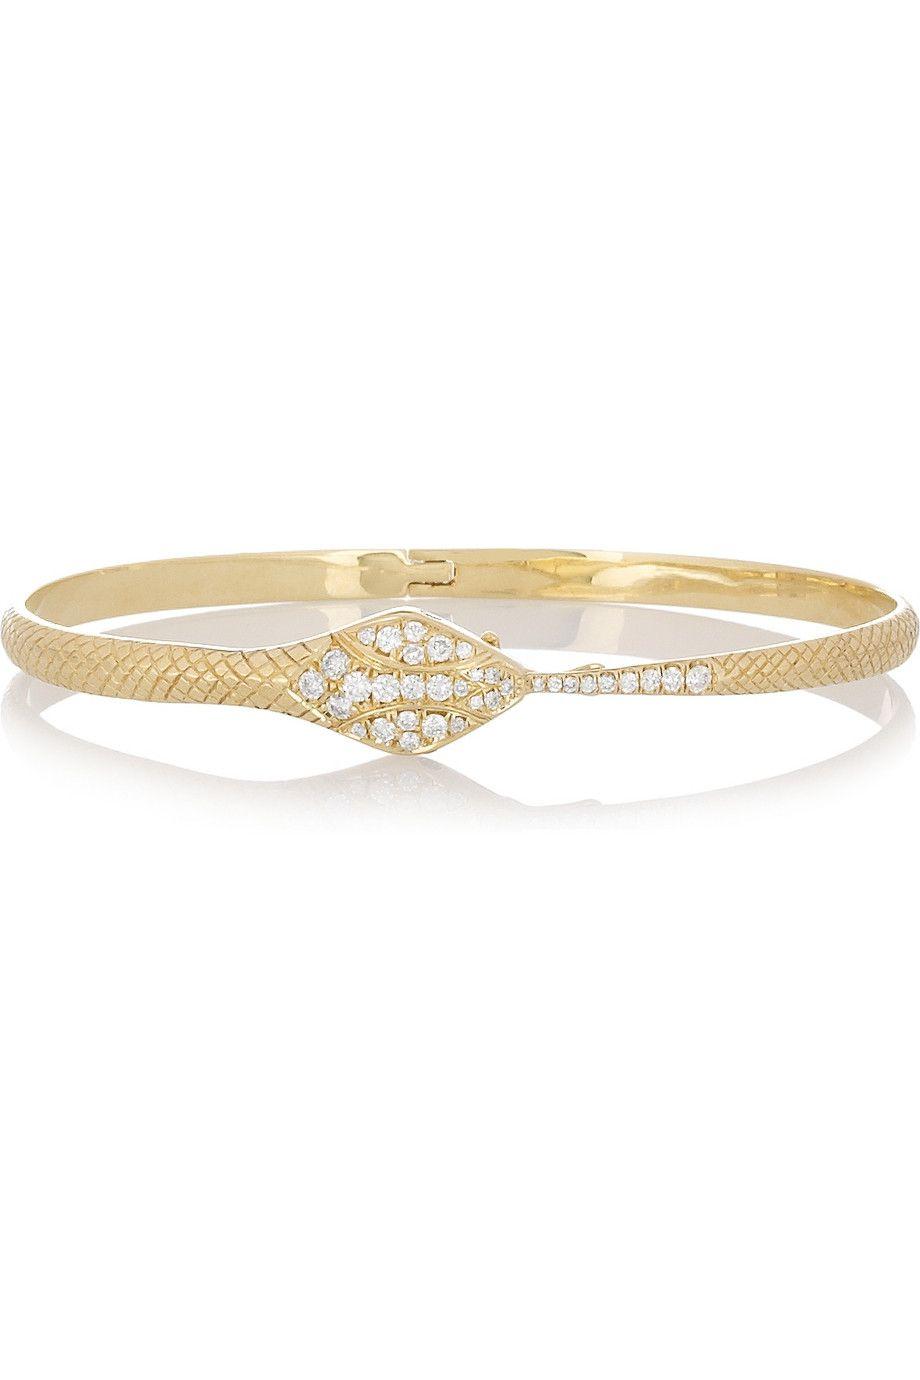 Anita Ko 18-karat Gold, Emerald And Diamond Bracelet